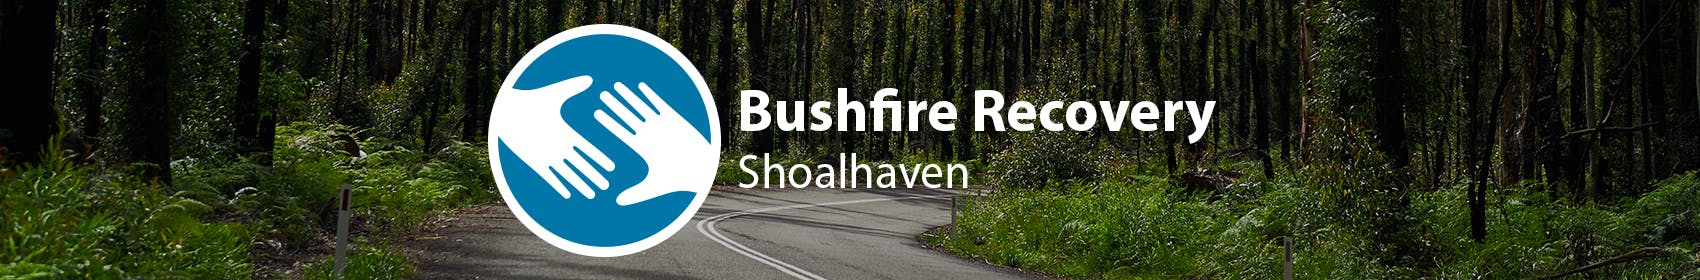 Bushfire Recovery Shoalhaven